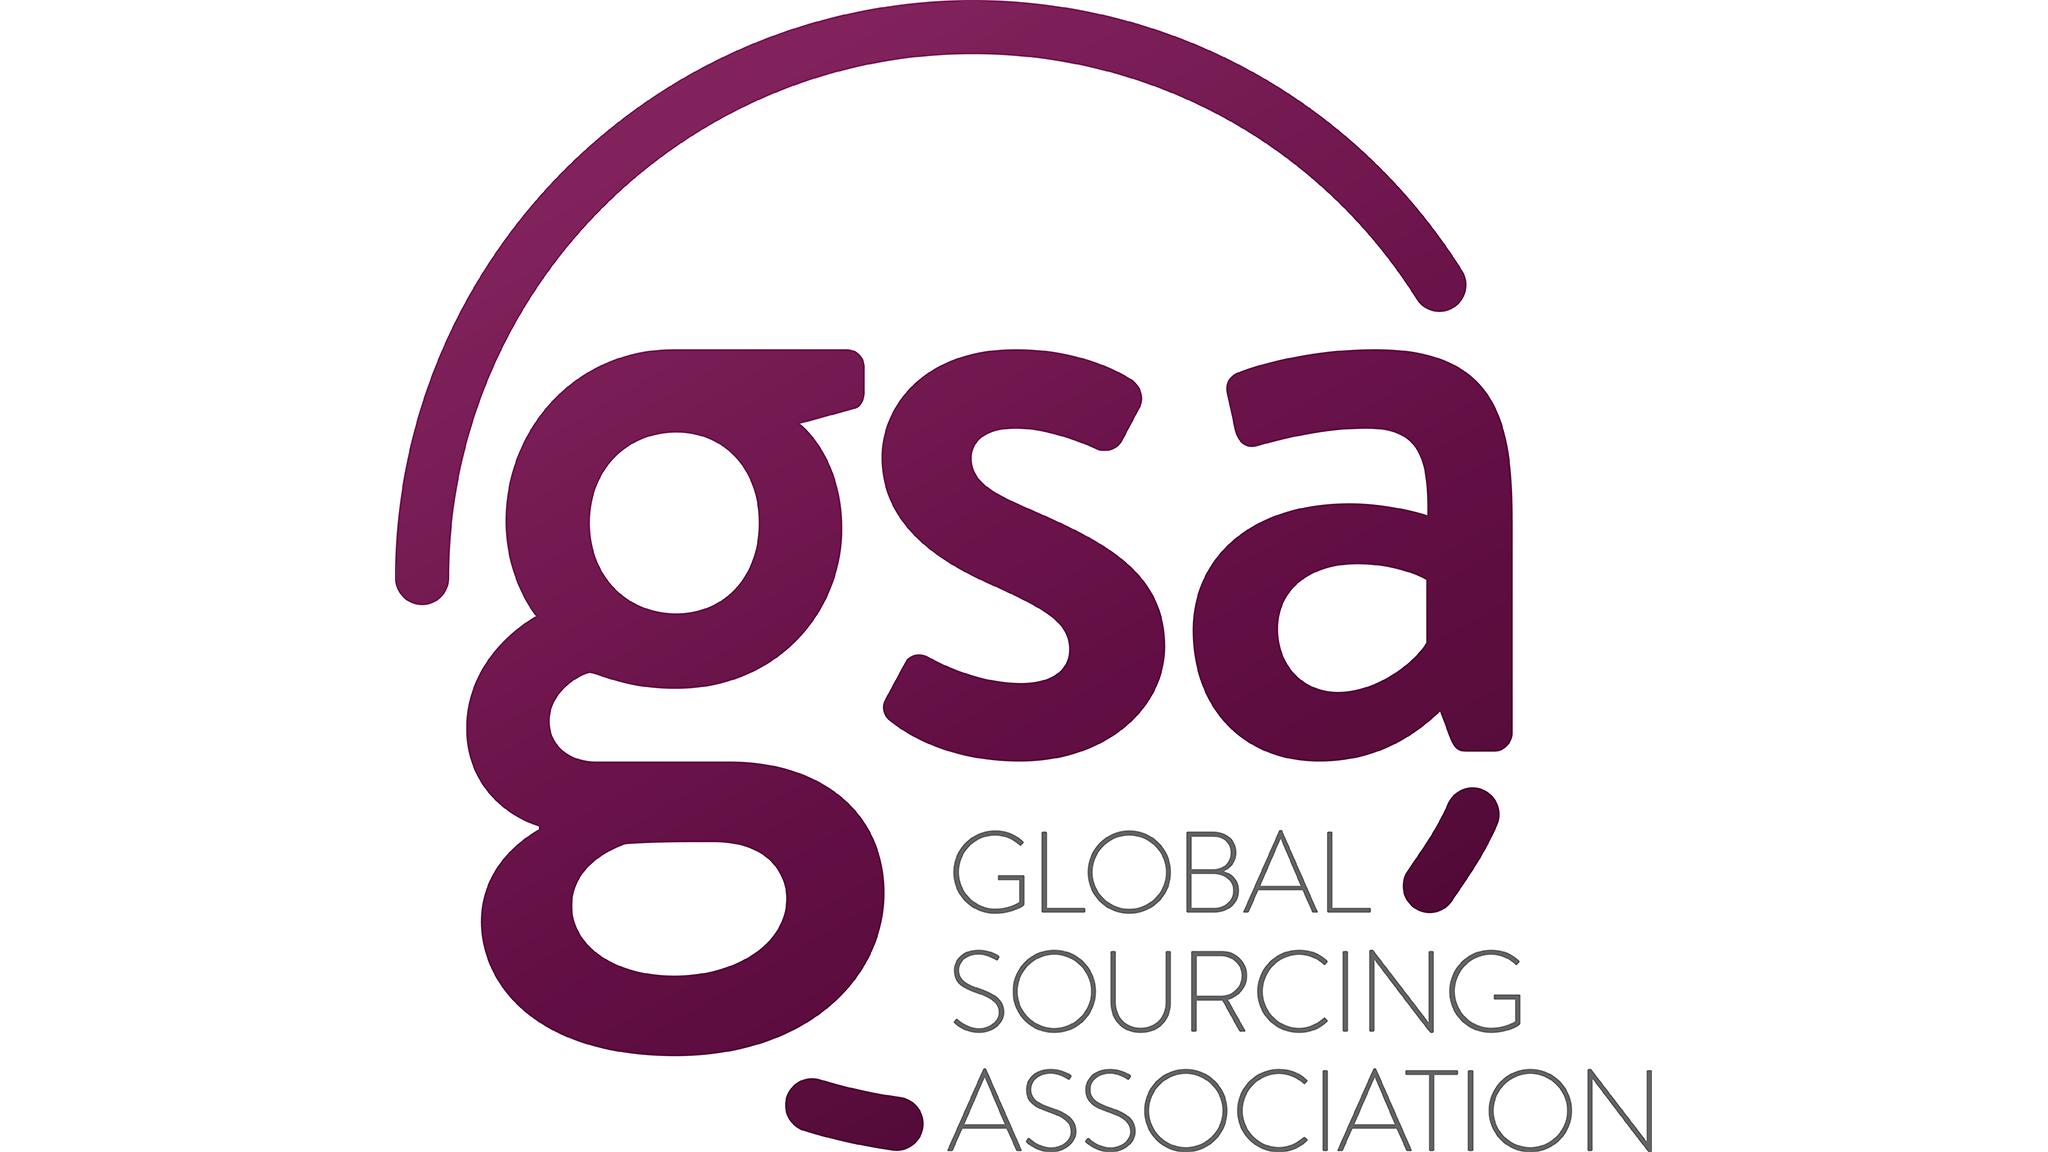 descri global outsourcing association - HD2048×1152